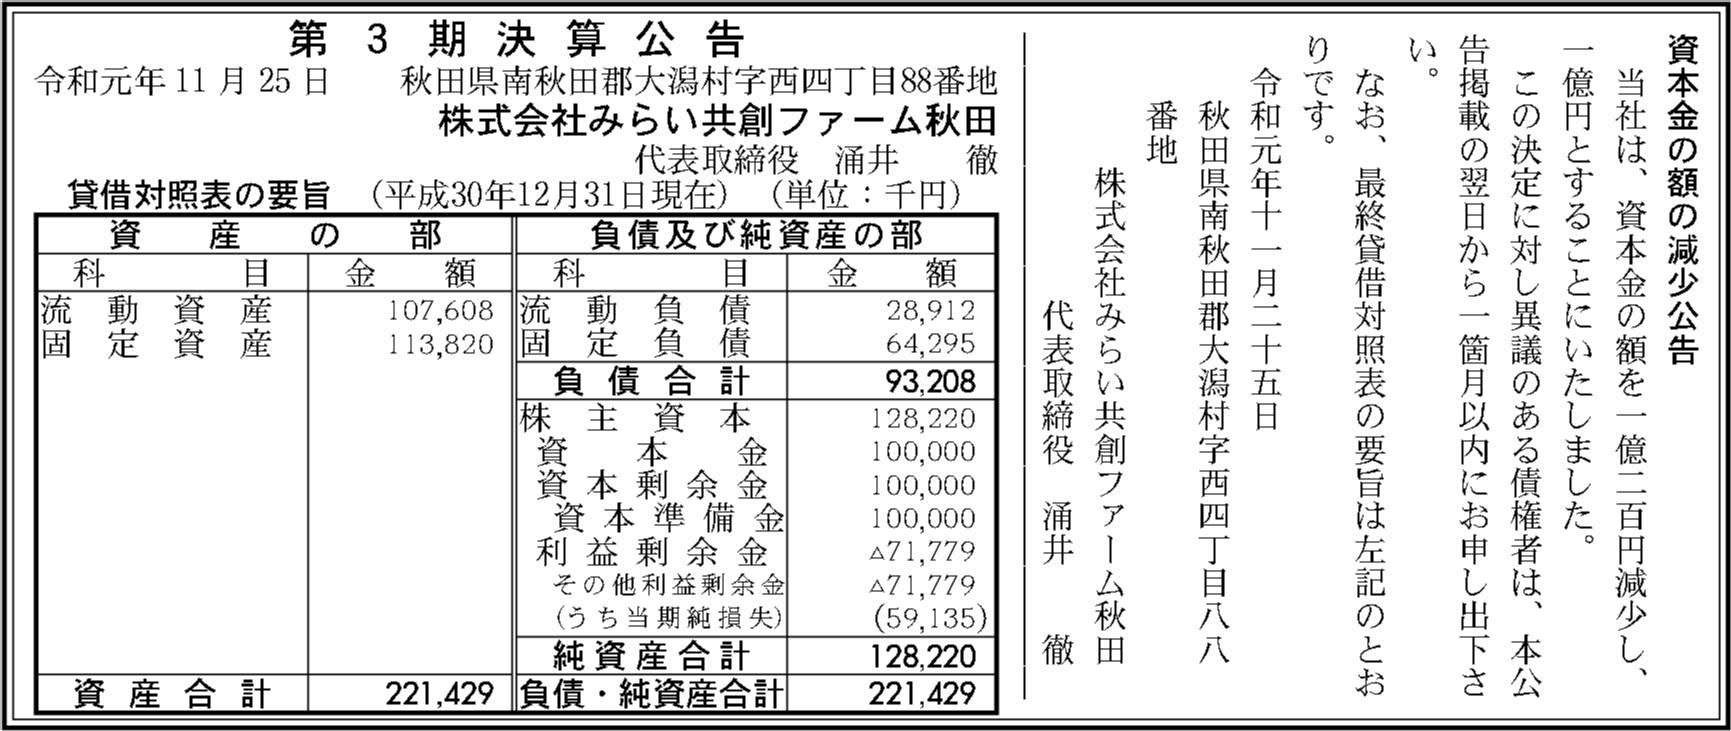 0051 2bbda73653cad06f1e8b742020ff9b3c51f01181e8b80a87bf8bfdfc2da9df5060513859e48409dd587d6464f8c9cf938824321321f303e0c14efd06dc99282f 07